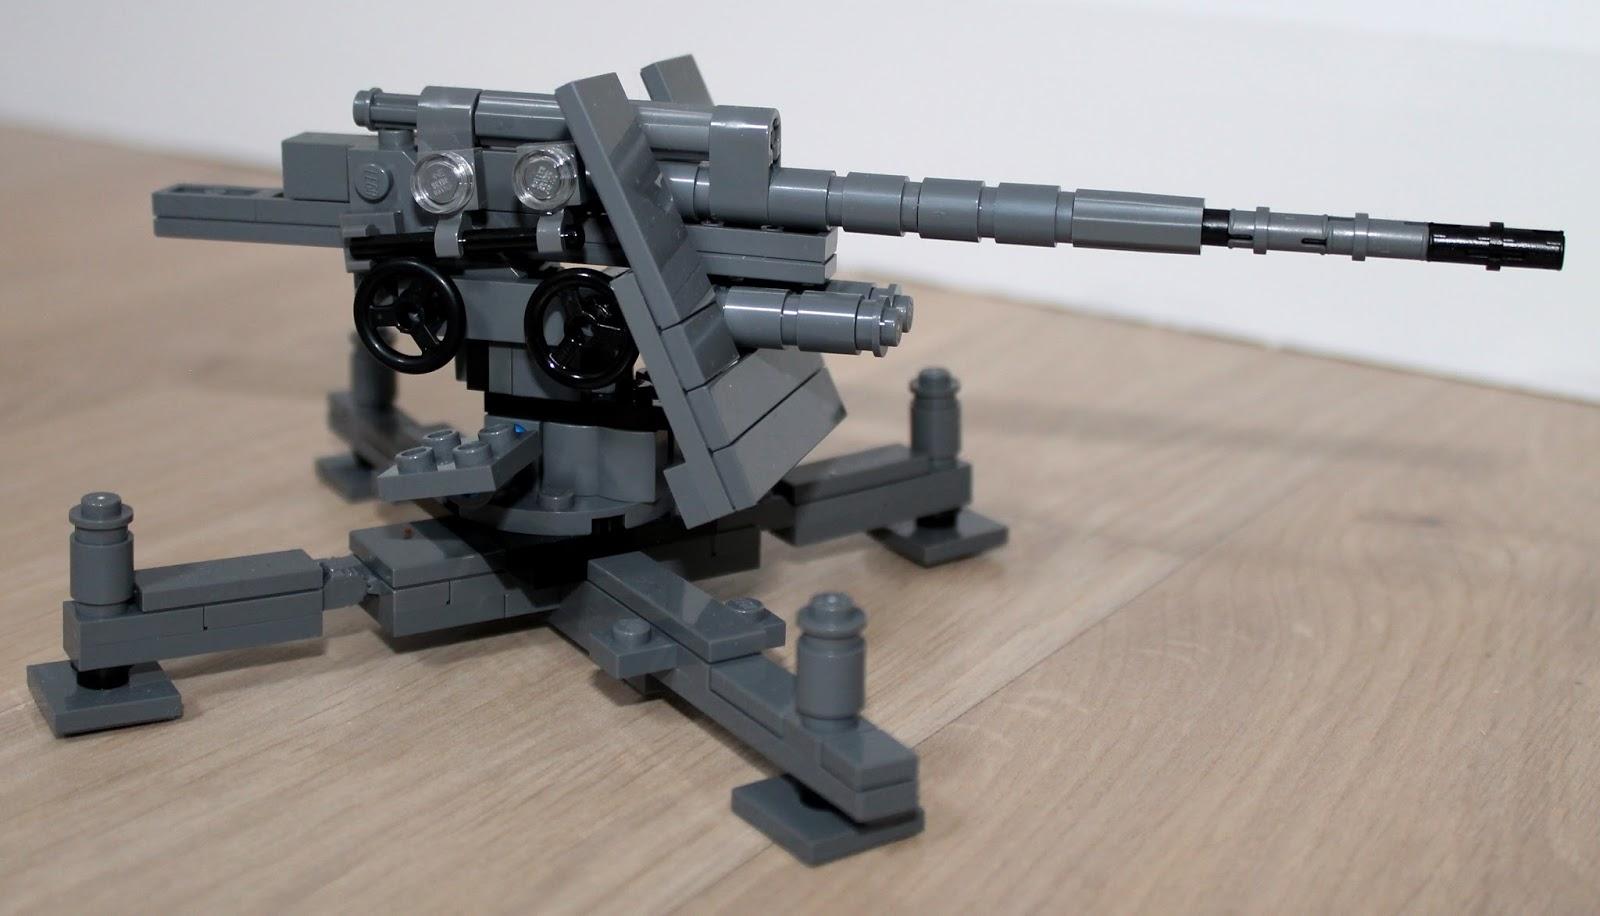 Lego Museums Brickmania Flak 36 88 Cm Anti Aircraft Gun Review